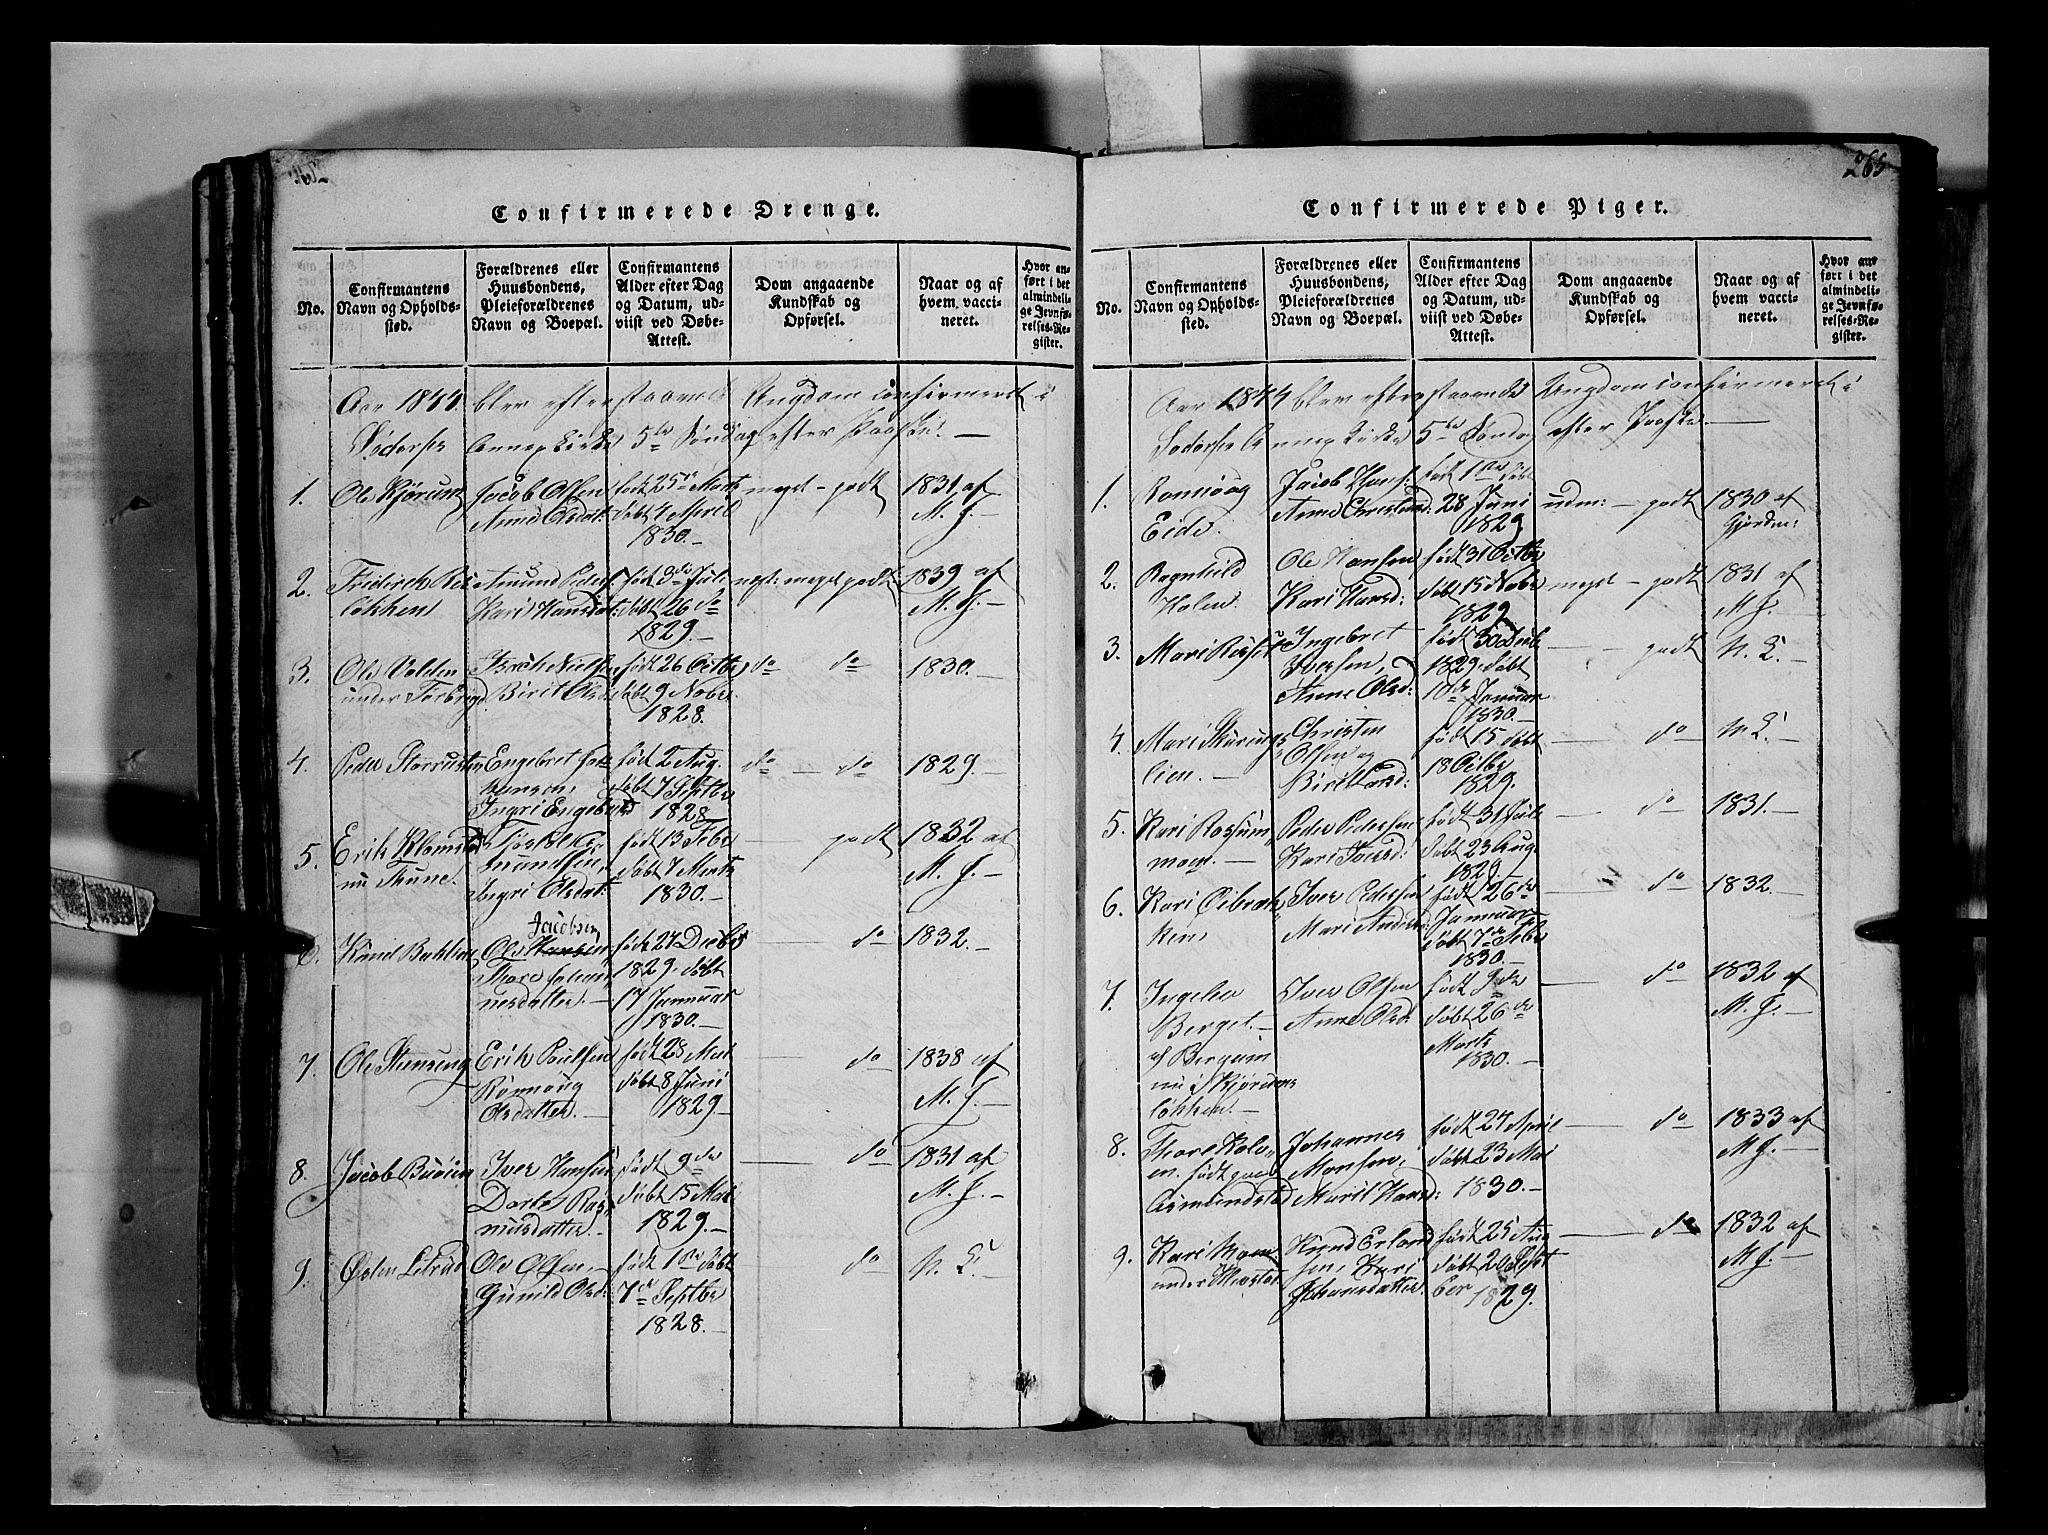 SAH, Fron prestekontor, H/Ha/Hab/L0002: Klokkerbok nr. 2, 1816-1850, s. 265